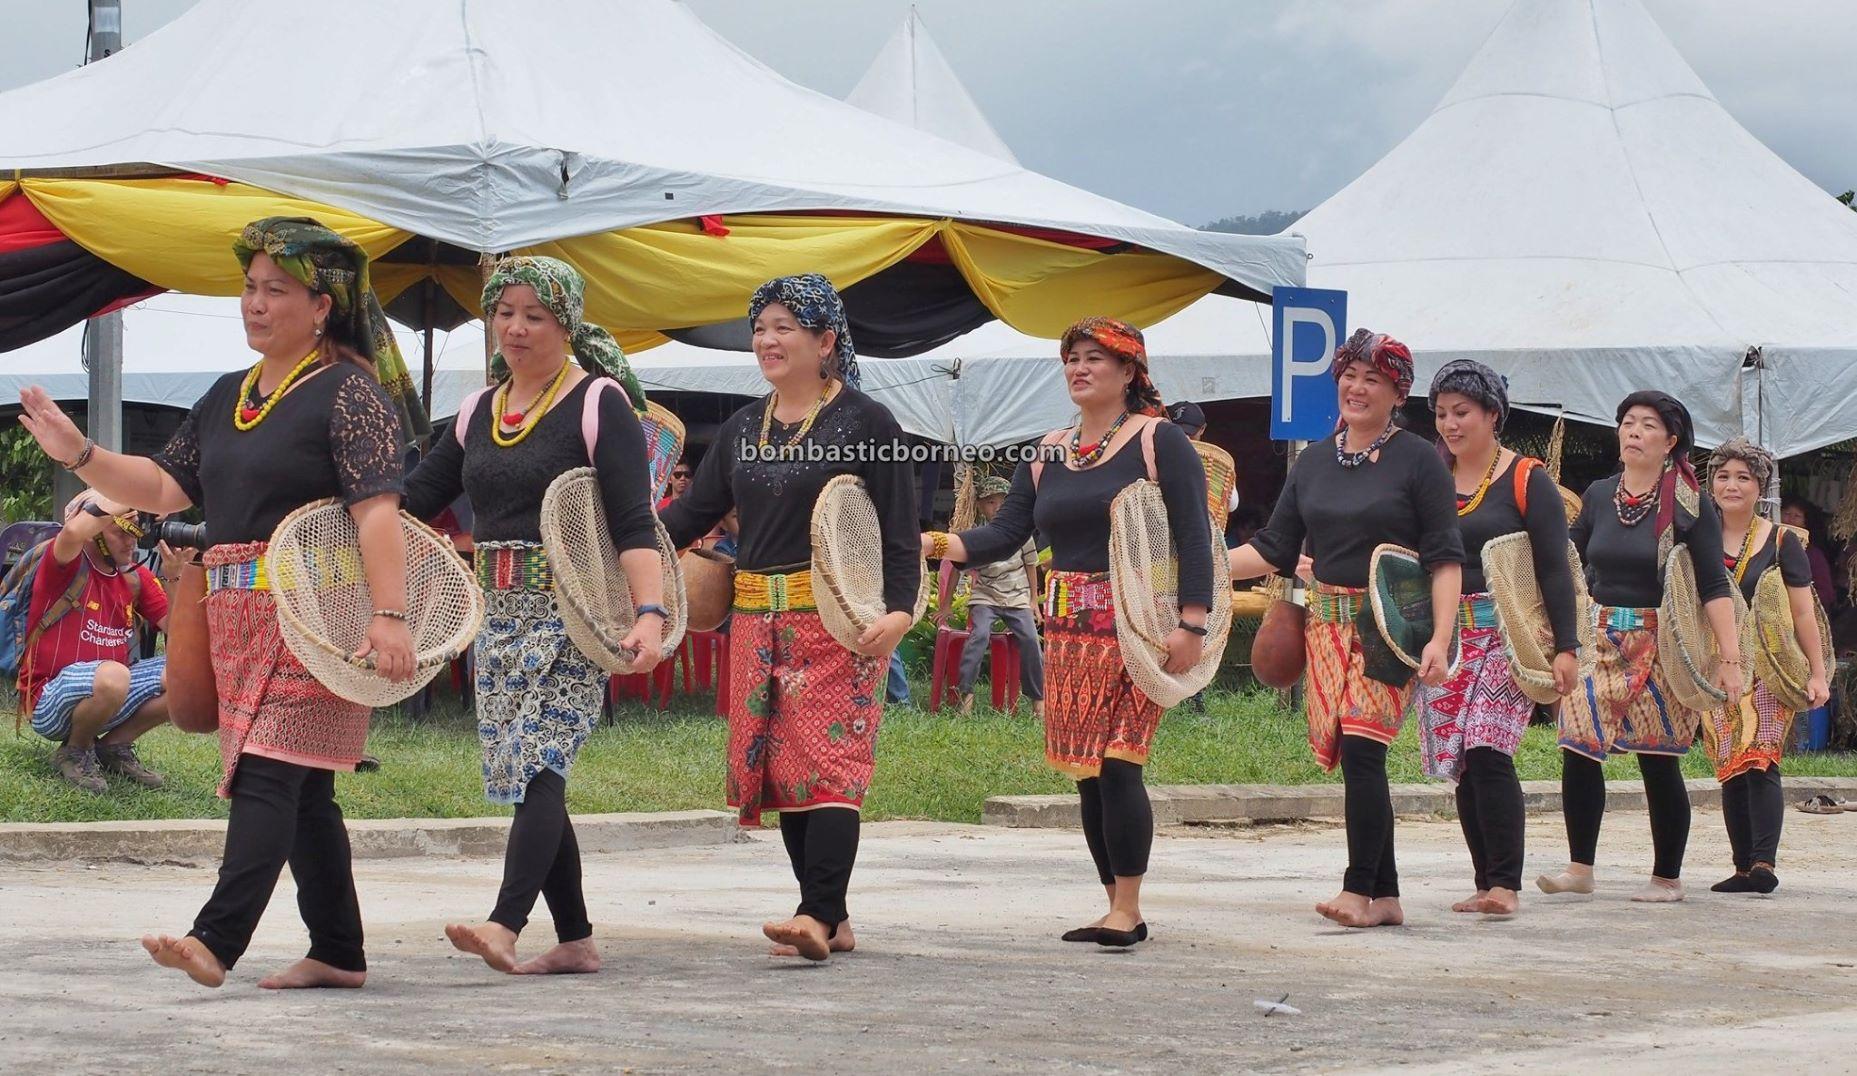 Bario Food Cultural Festival, traditional dance, event, authentic, indigenous, Dayak Kelabit, native, Orang Ulu, tribal, Kelabit Highlands, Tourism, Borneo, 婆罗洲达雅文化, 巴里奥加拉毕族舞蹈, 乌鲁人土著部落,